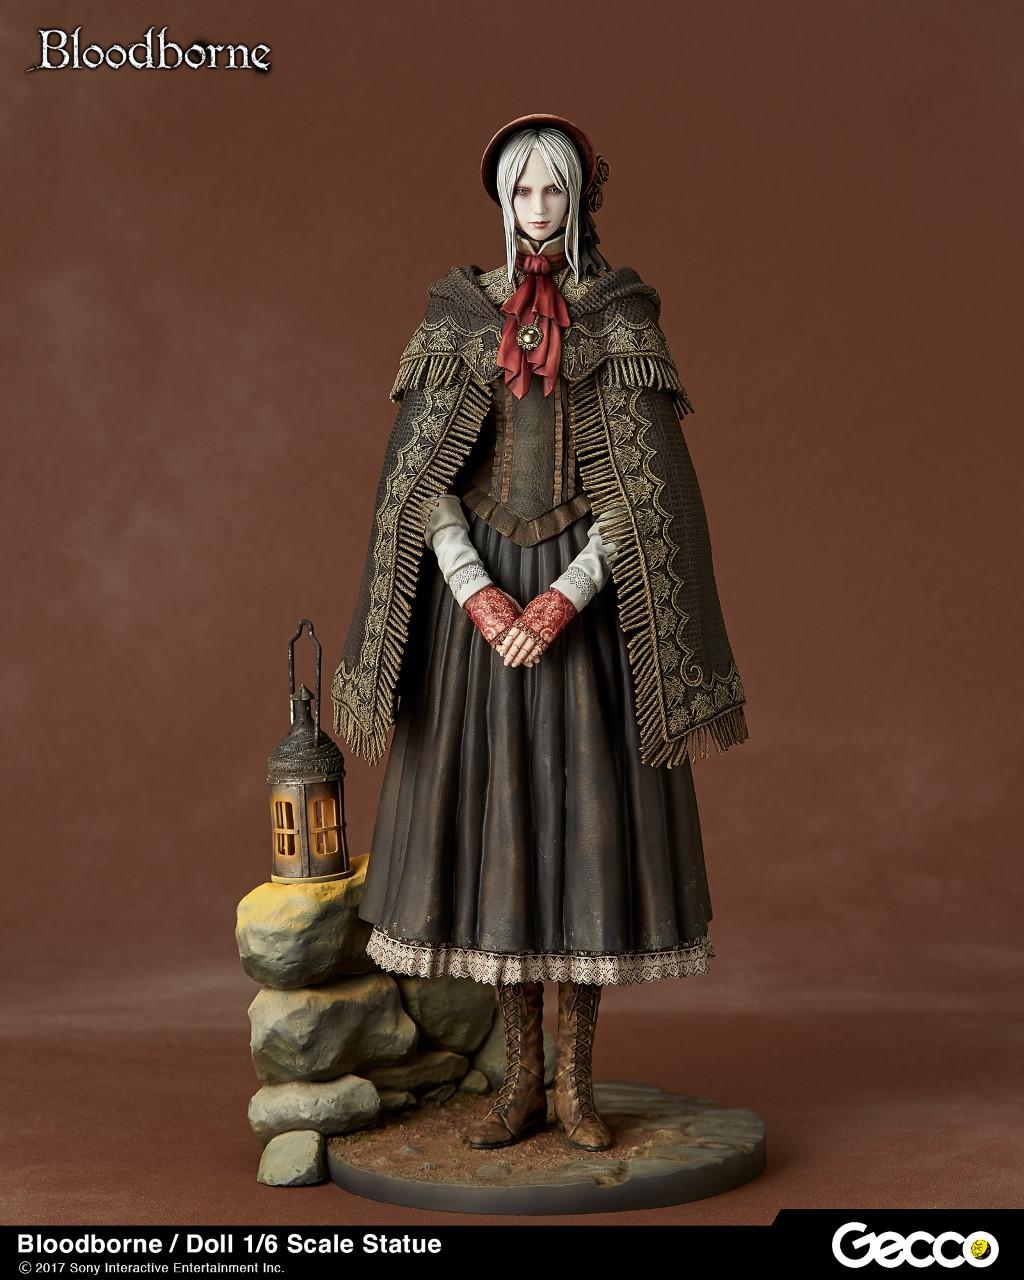 Bloodborne Doll